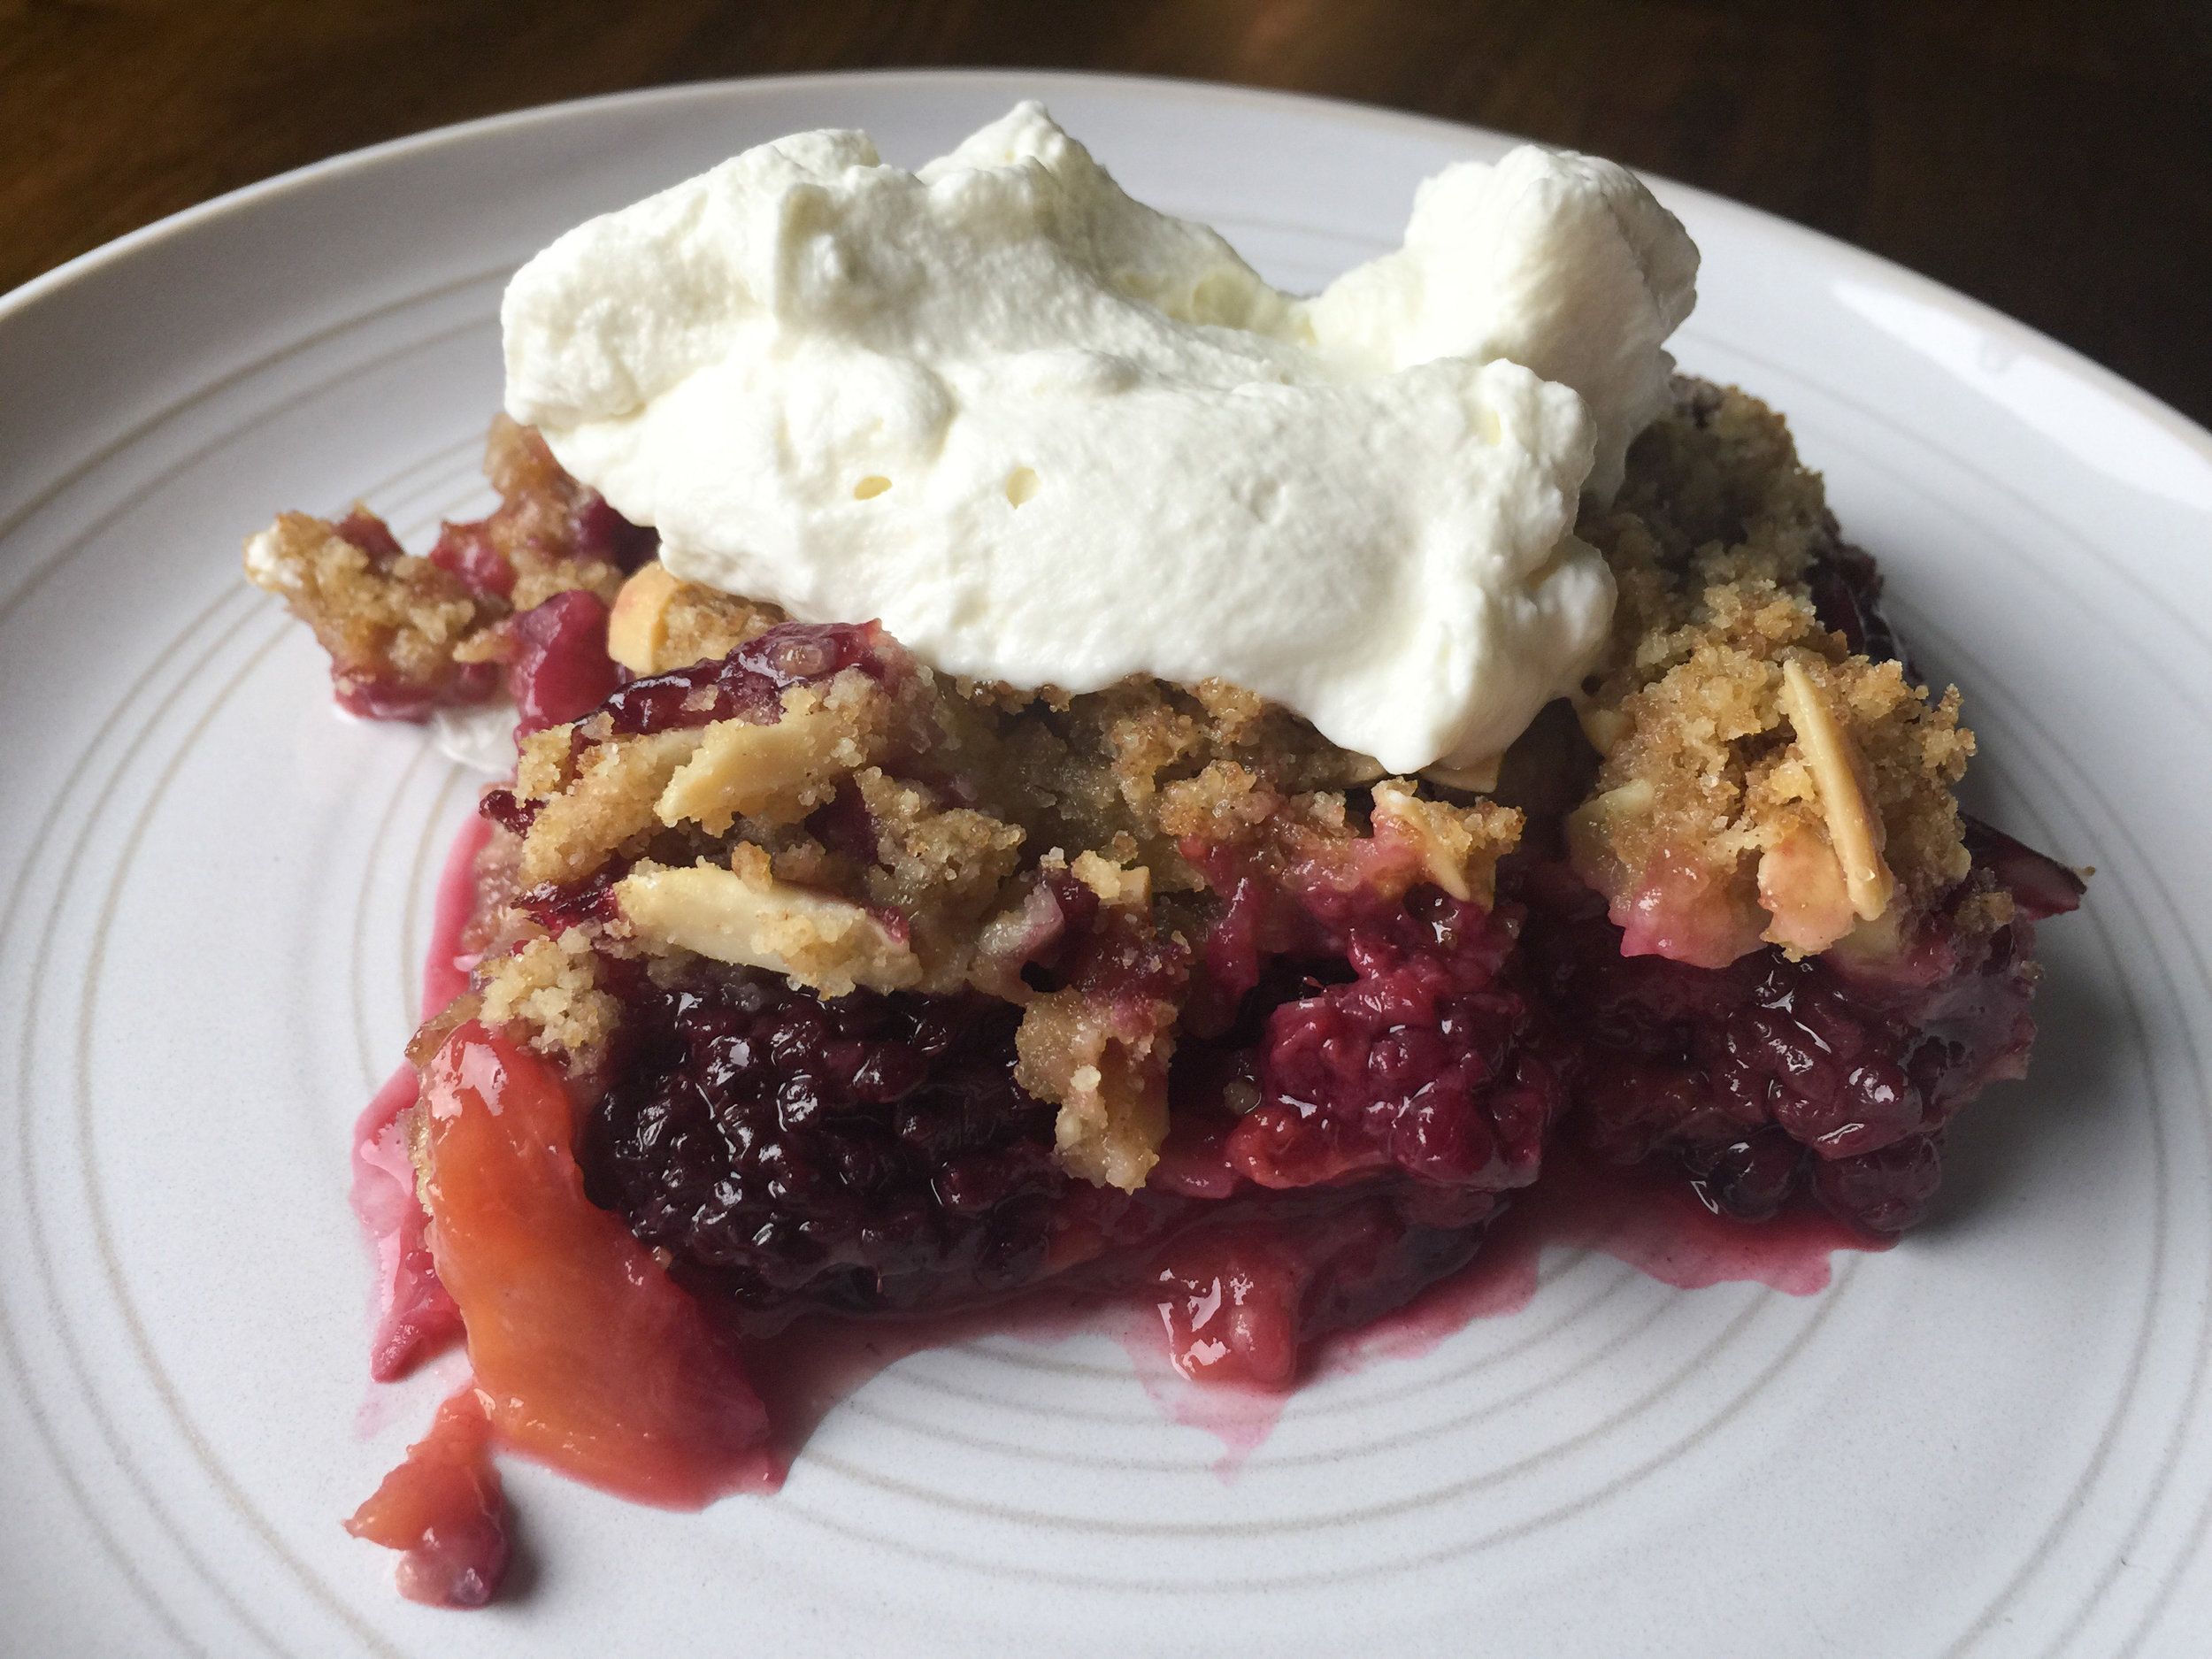 Berry and peach crisp recipe